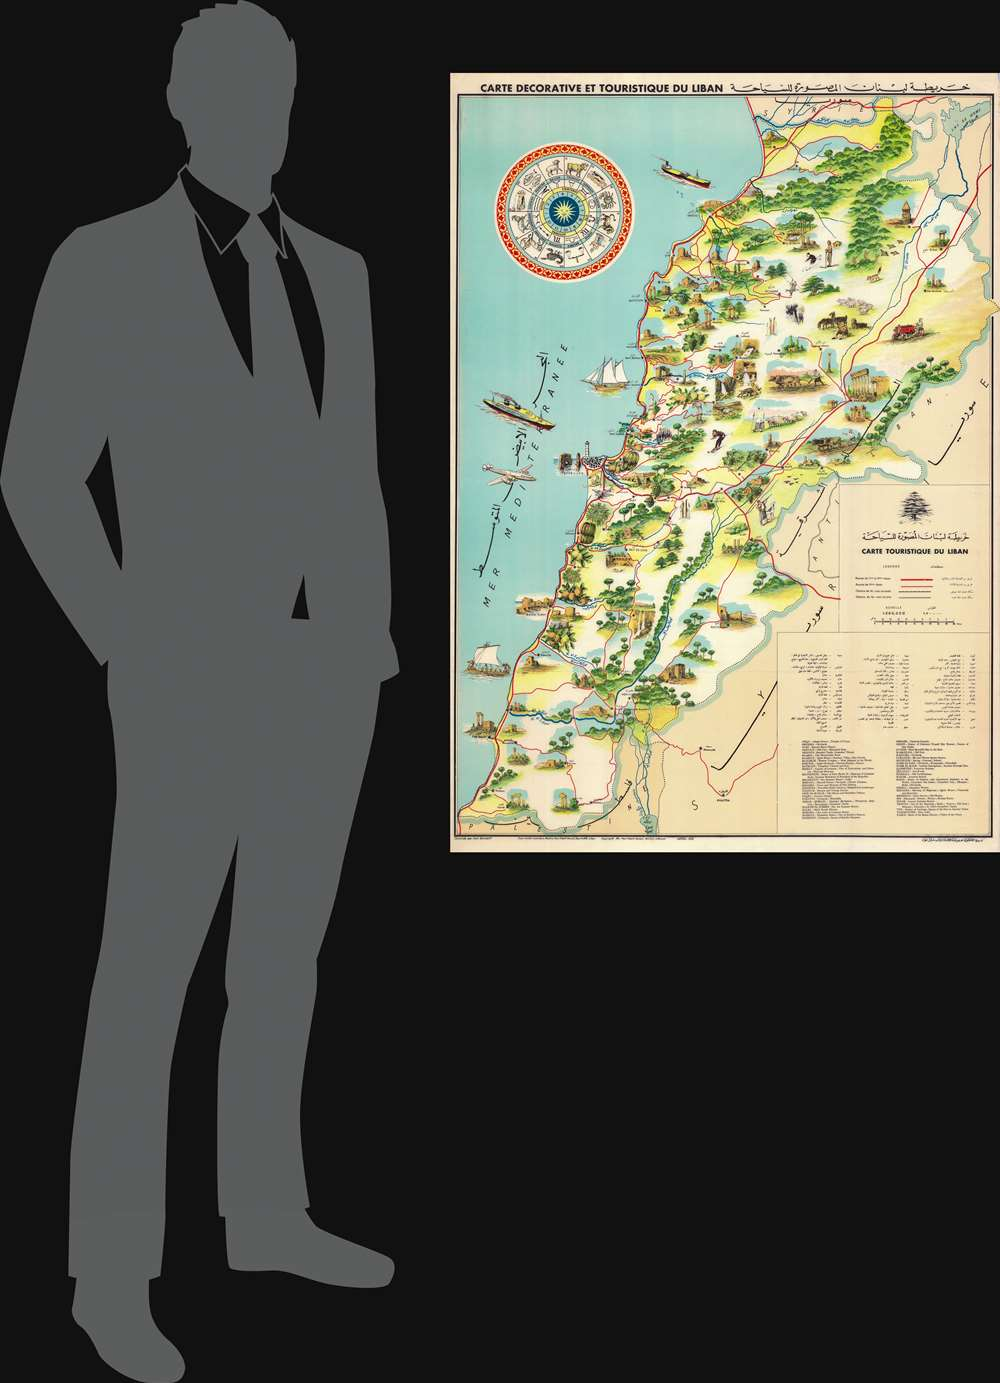 Carte Decorative et Touristique du Liban. خريطة لبنان المصورة للسياحة - Alternate View 1